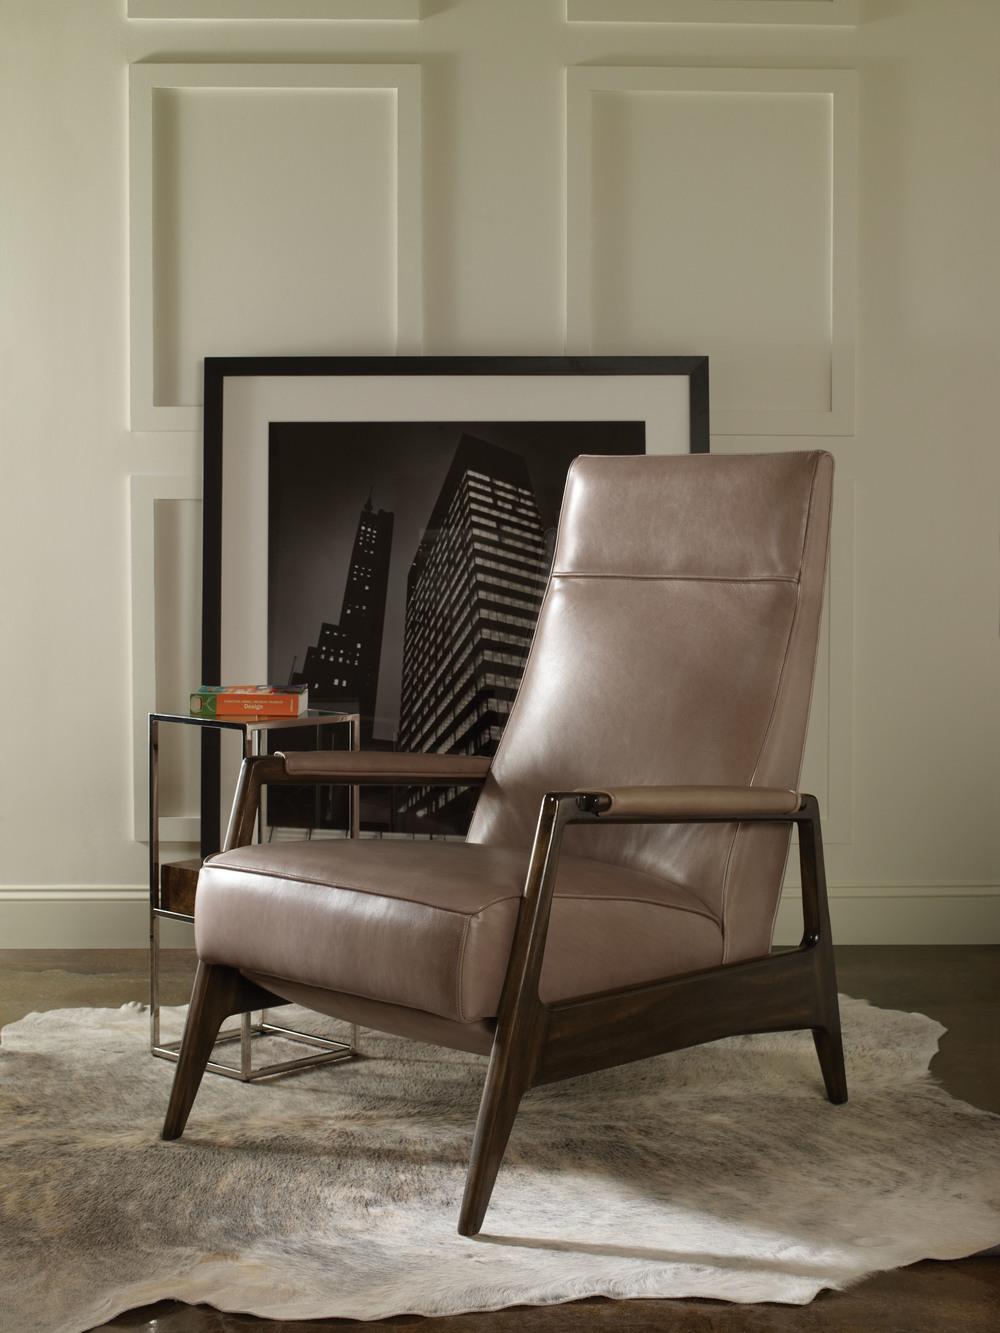 Vanguard Furniture - Woodley Recliner